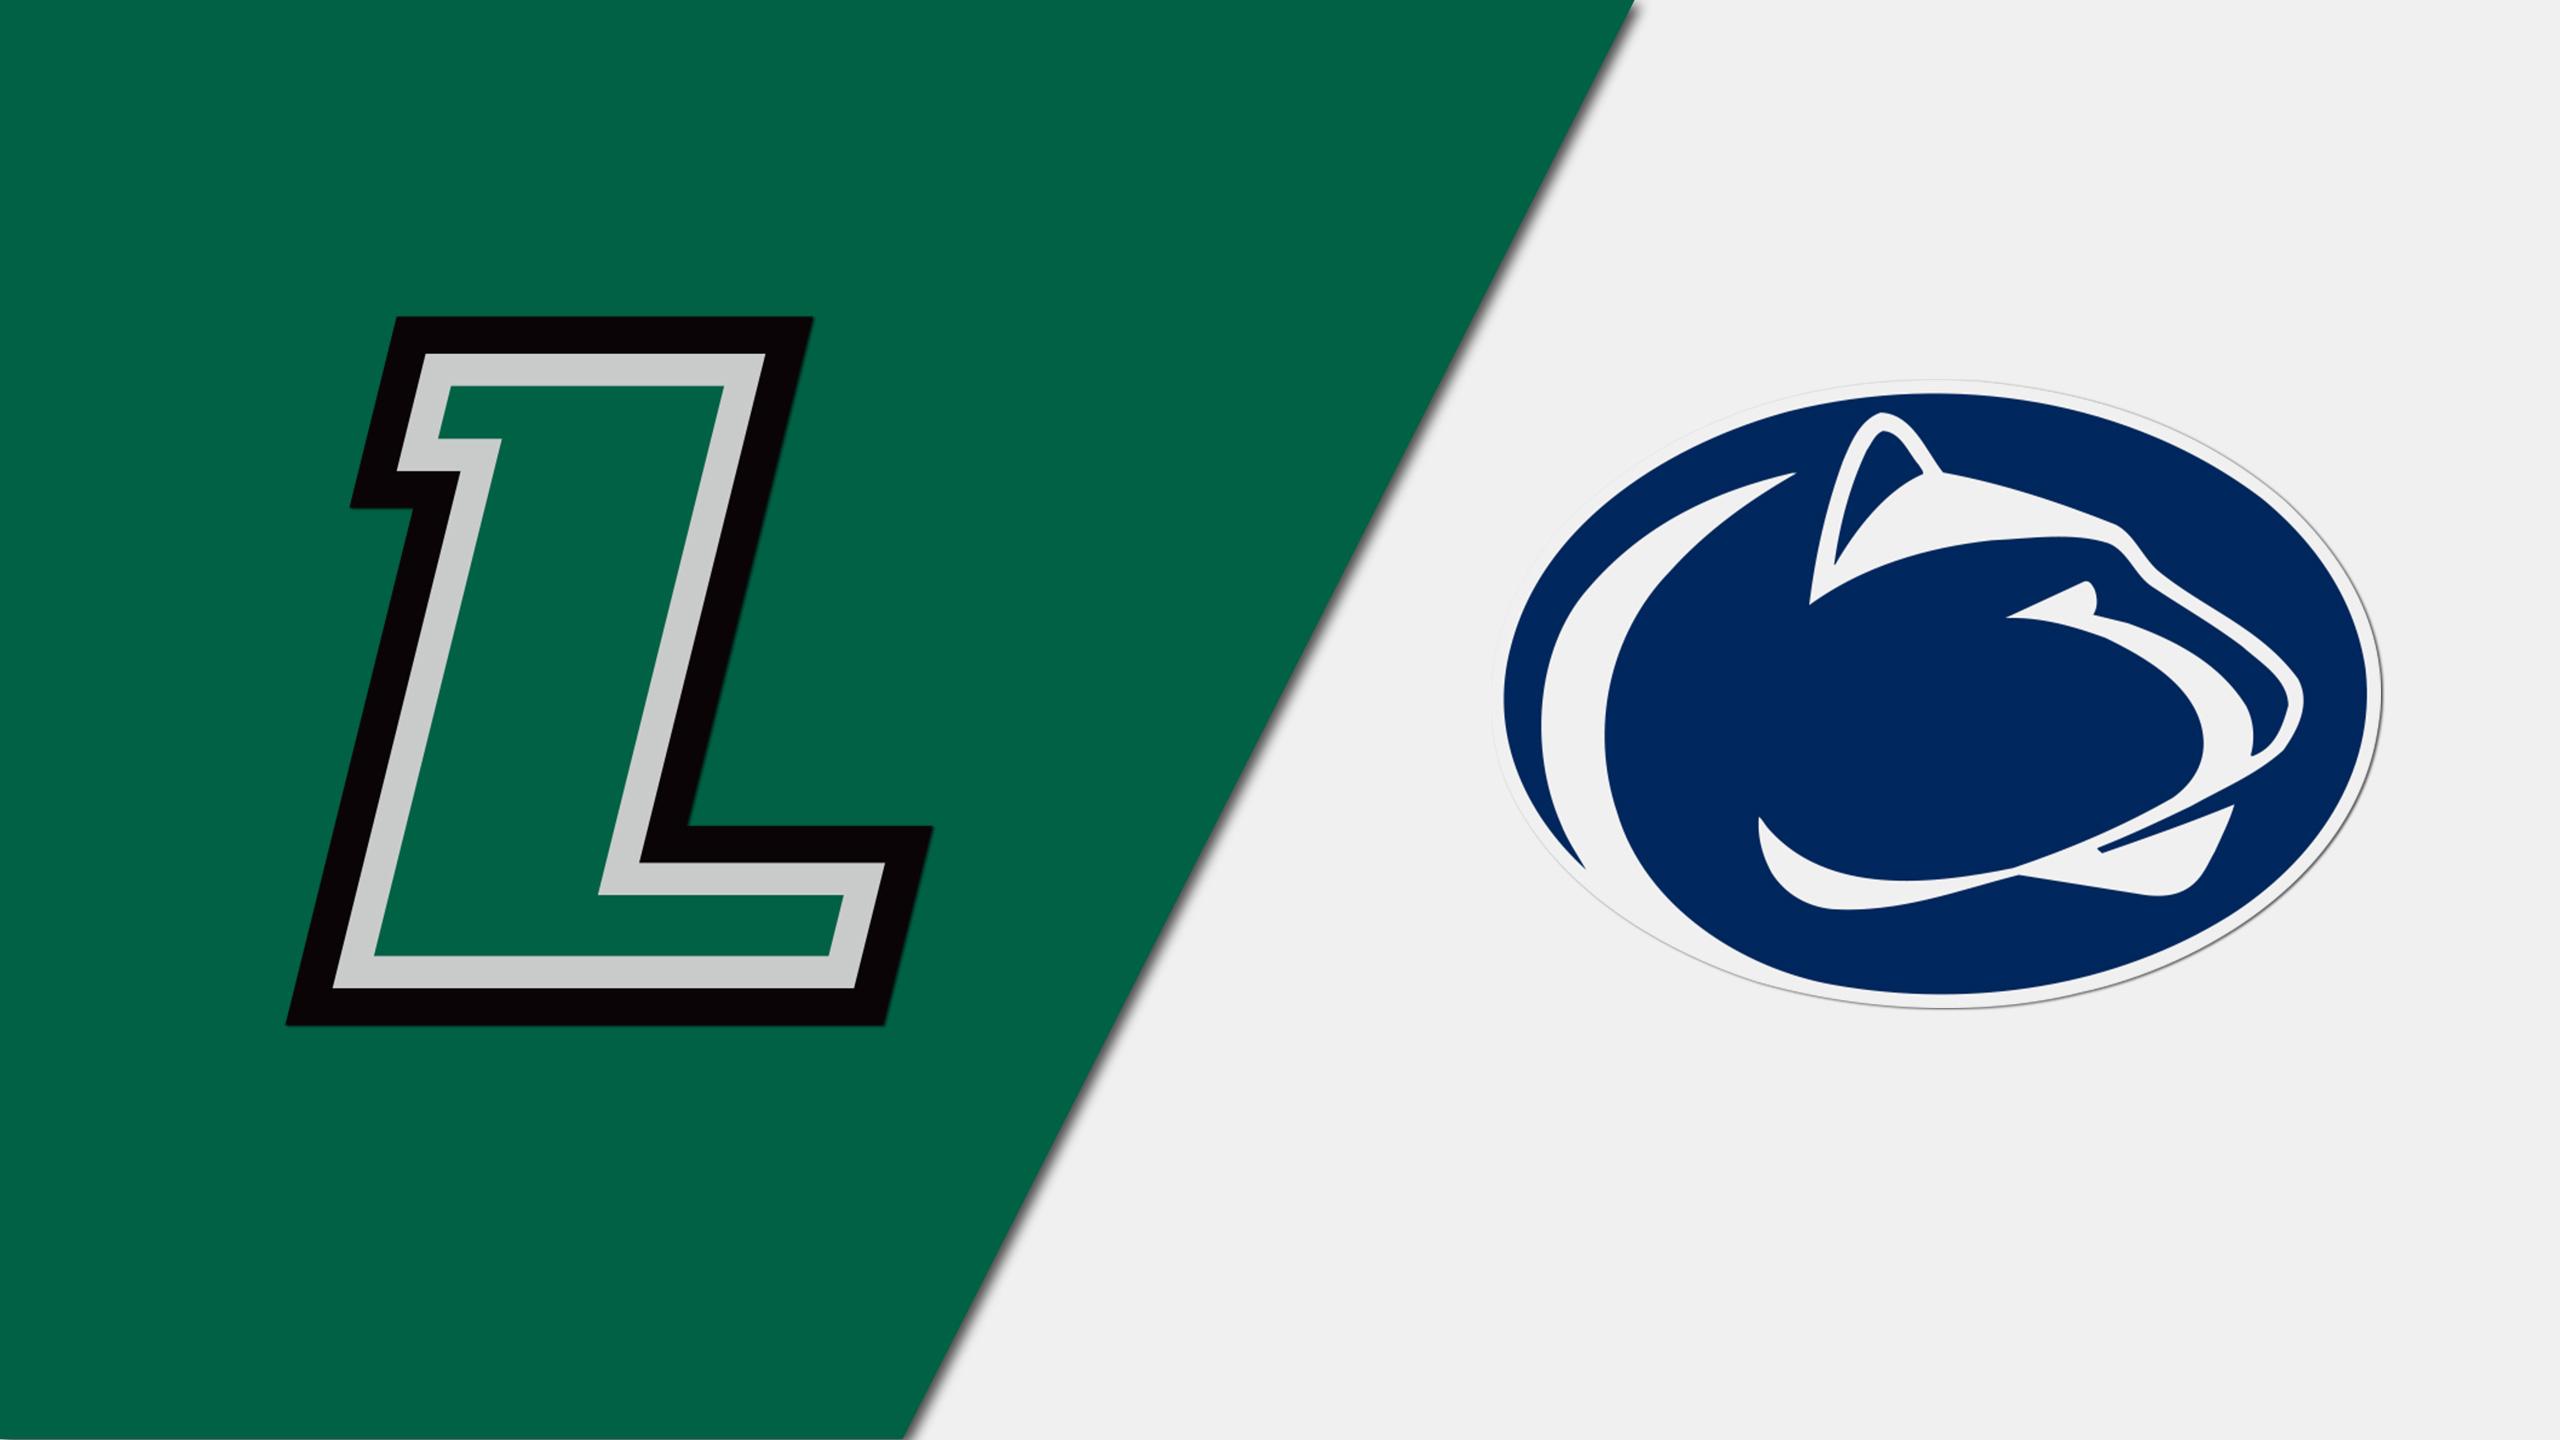 #8 Loyola (MD) vs. #1 Penn State (Quarterfinal)